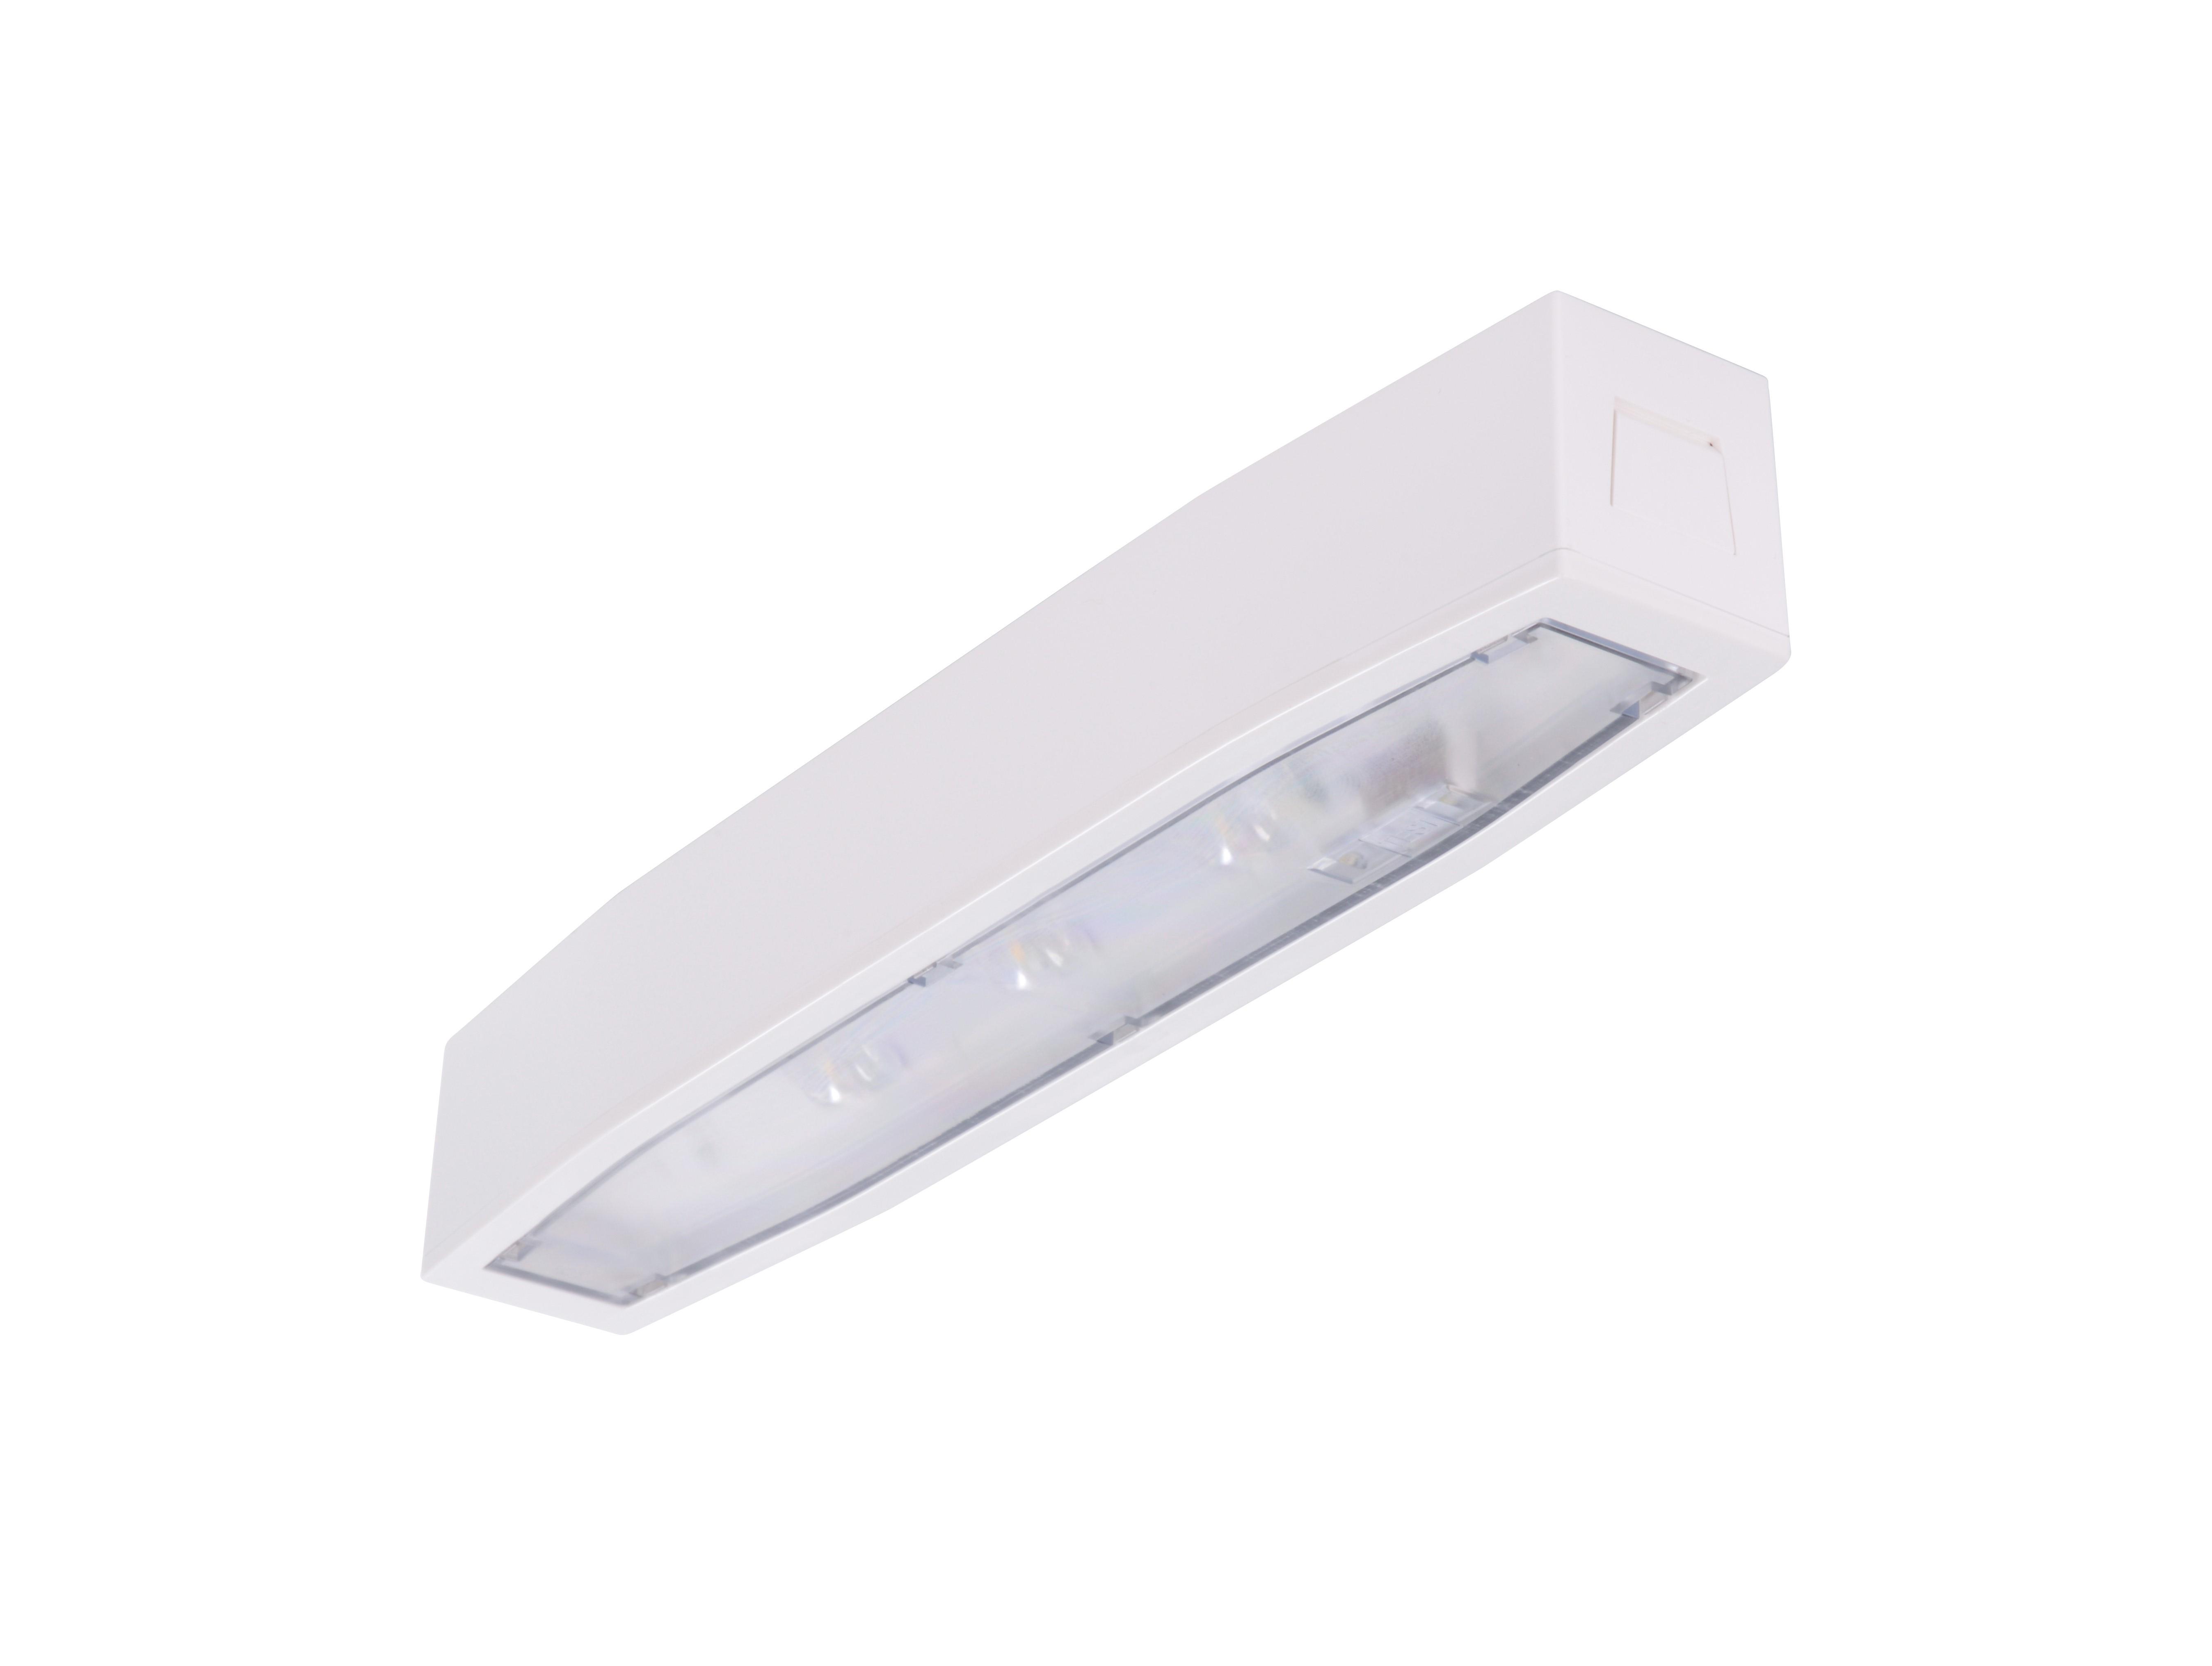 Lampa antipanica led Intelight 94714   3h mentinut test automat 0